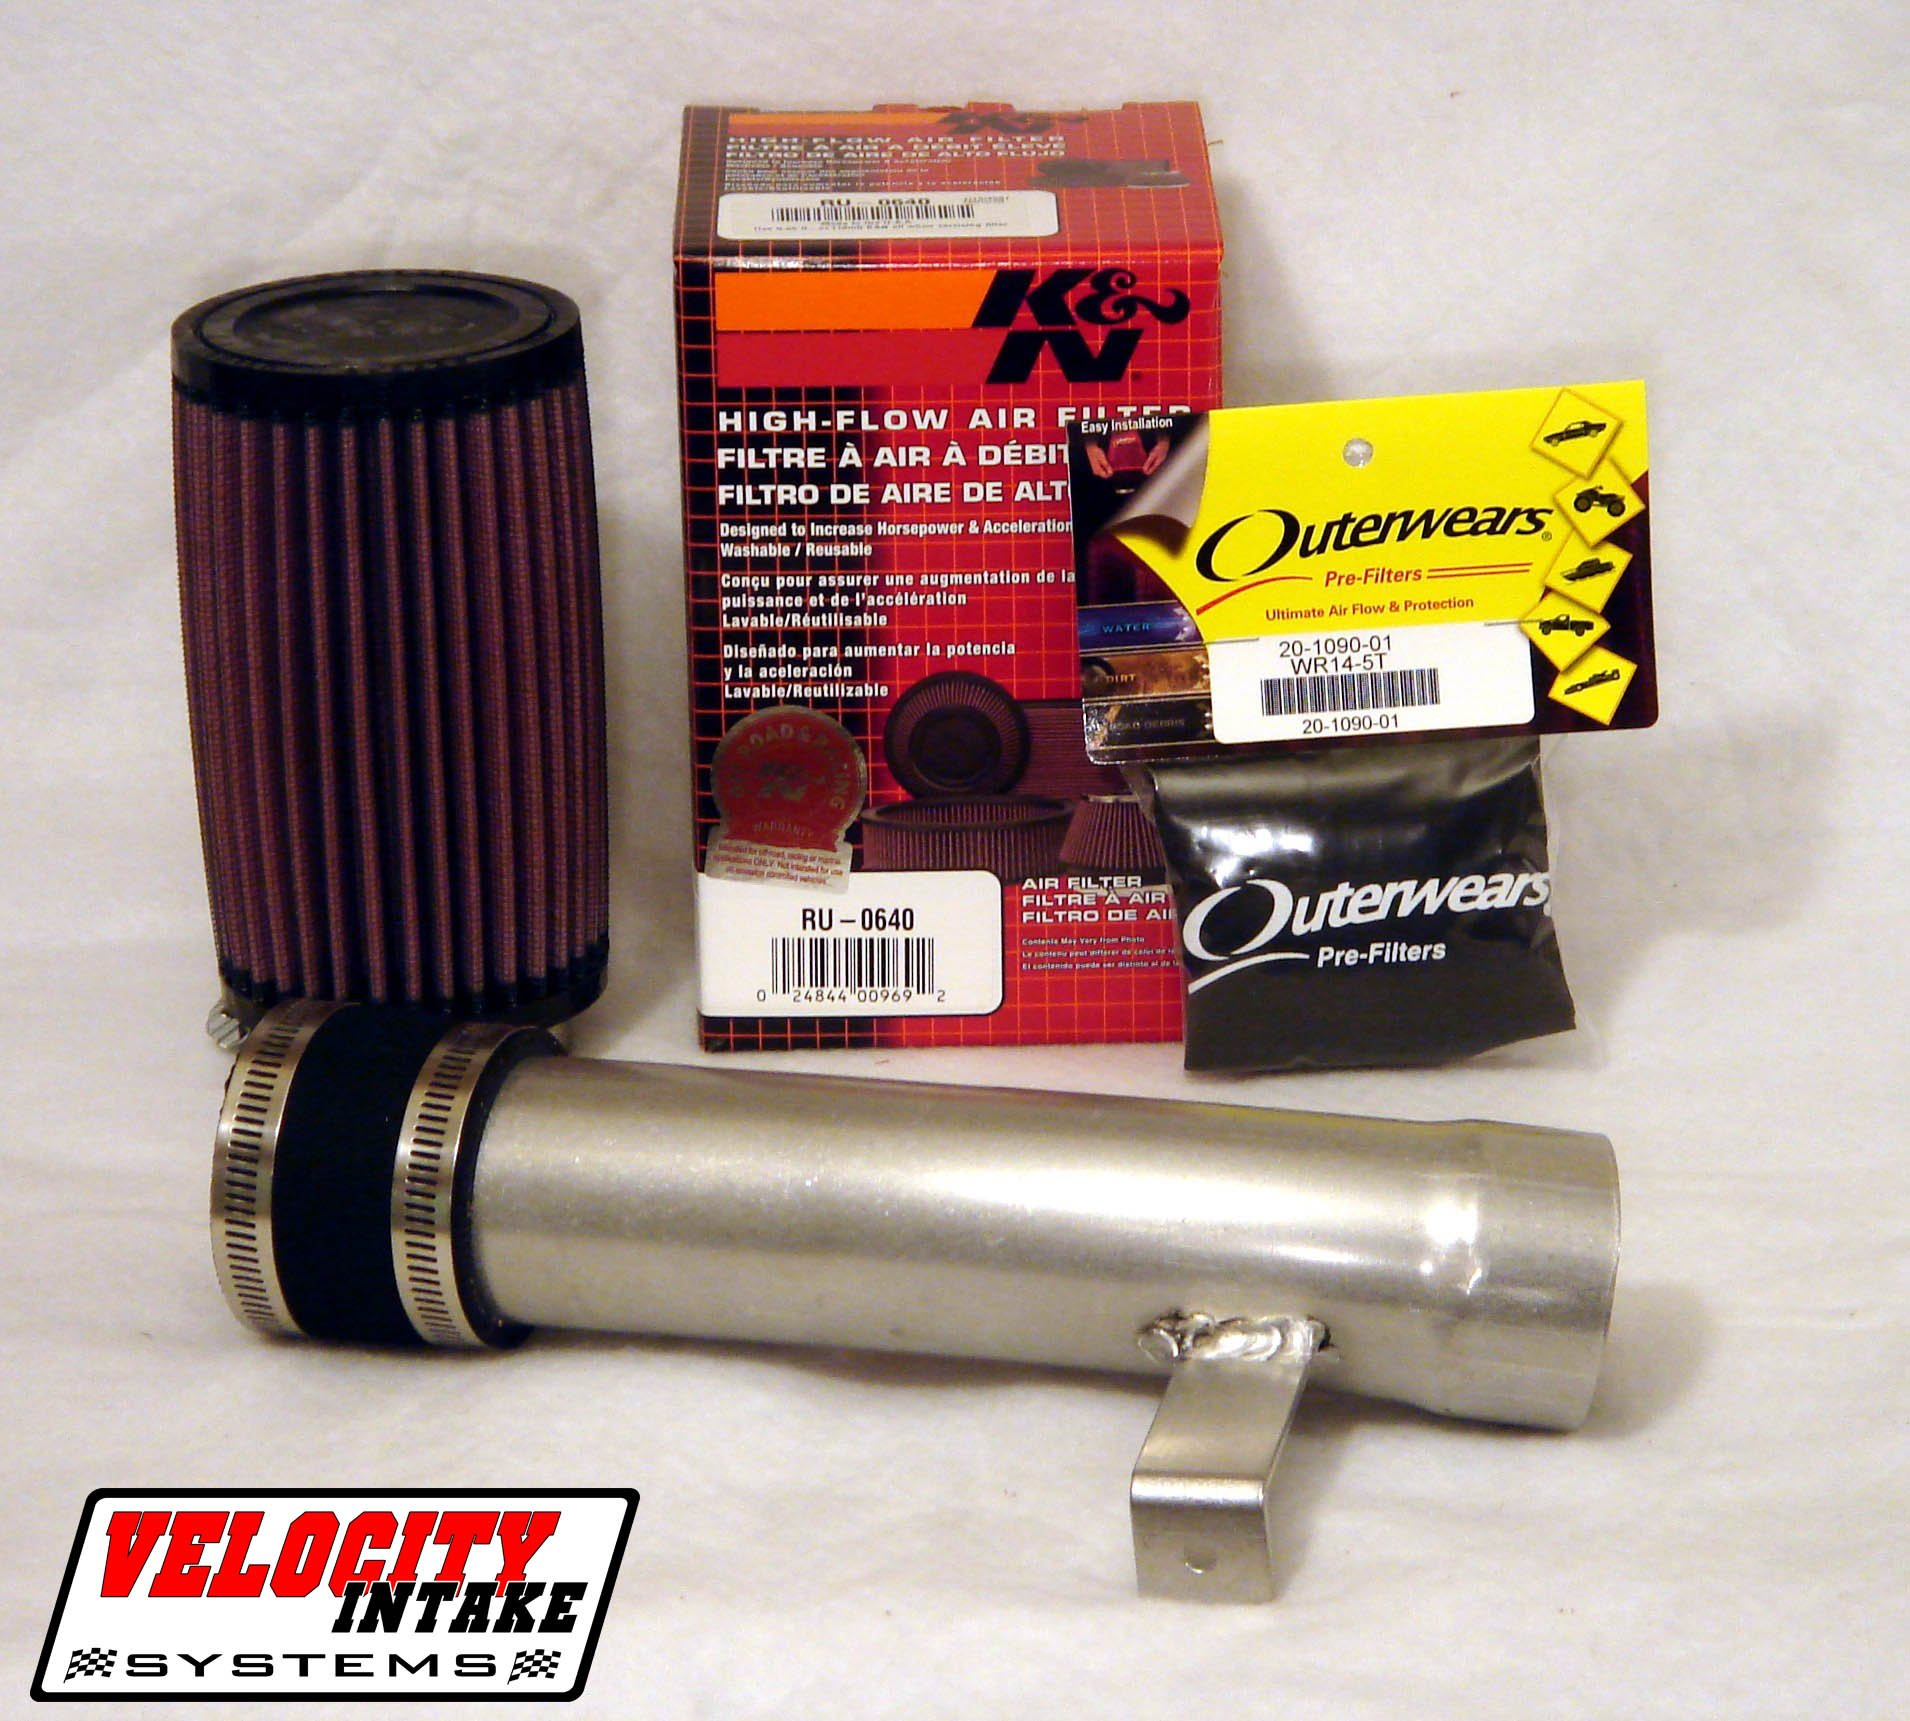 Malone Motorsports VelI-400ex-1 Honda 400ex Velocity Intake System with K&N Filter by Velocity Intake Systems